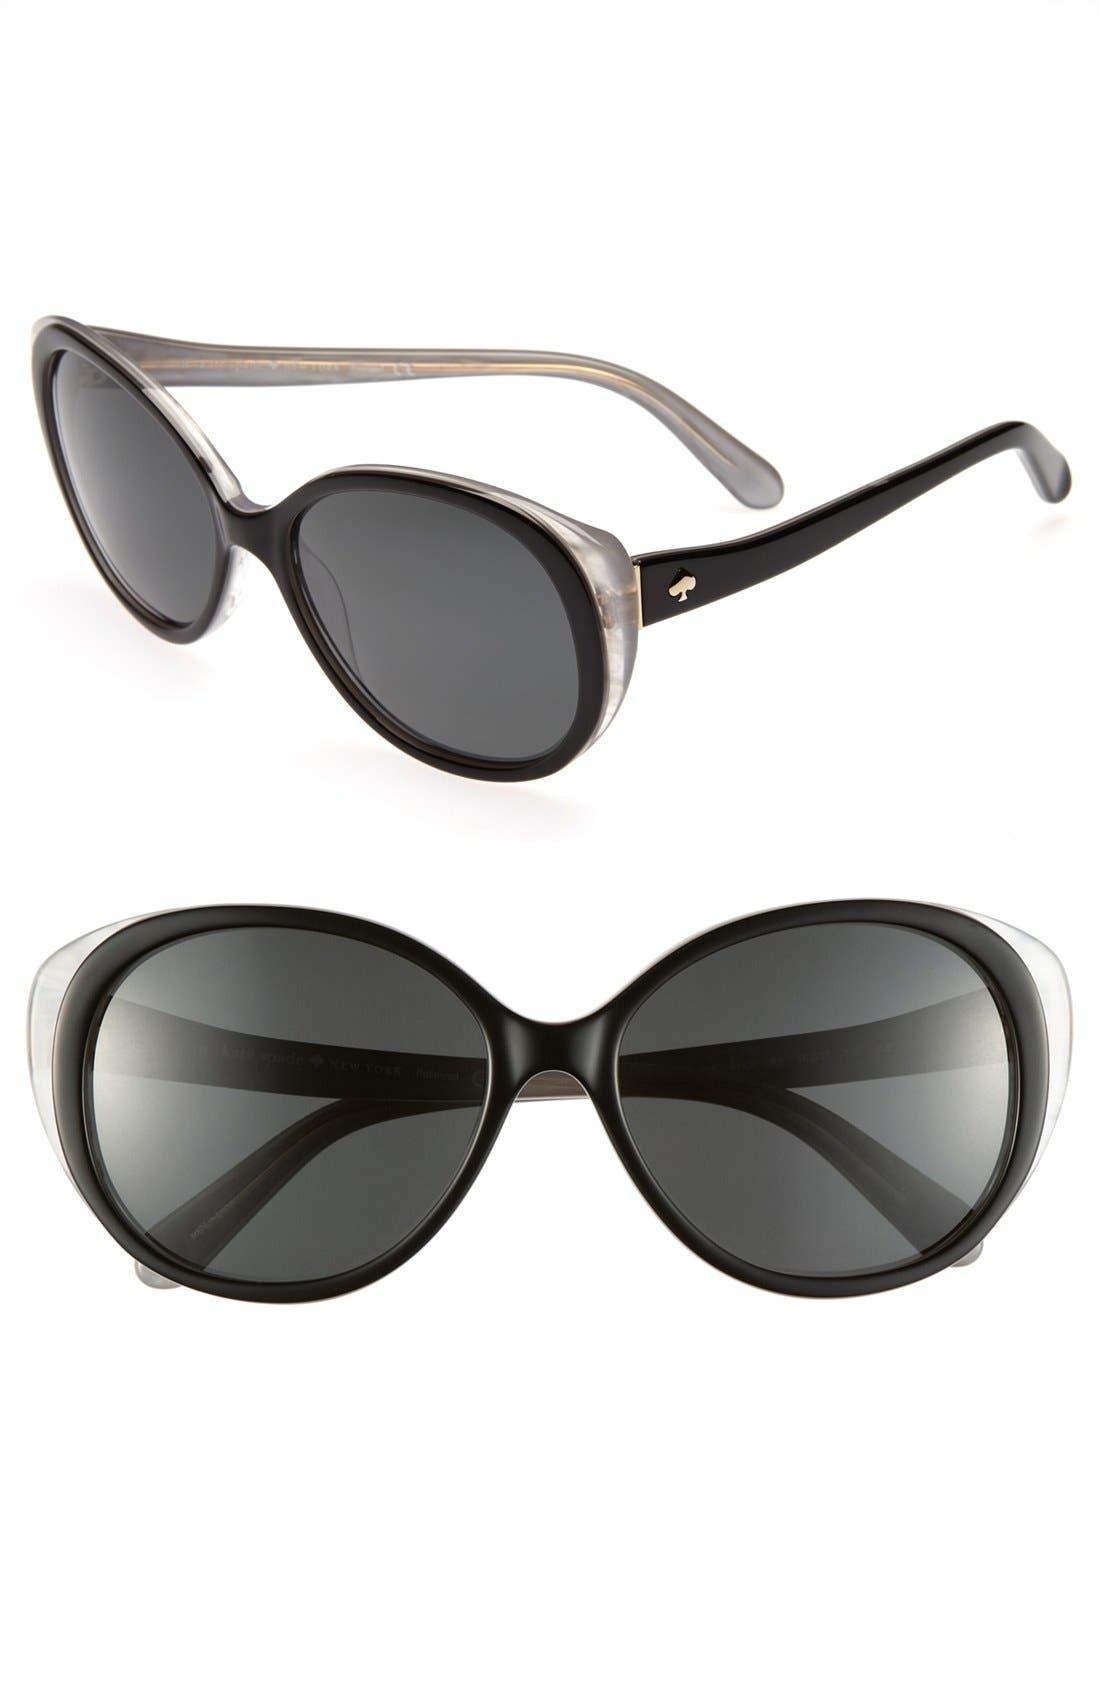 Main Image - kate spade new york 'finola' 56mm polarized sunglasses